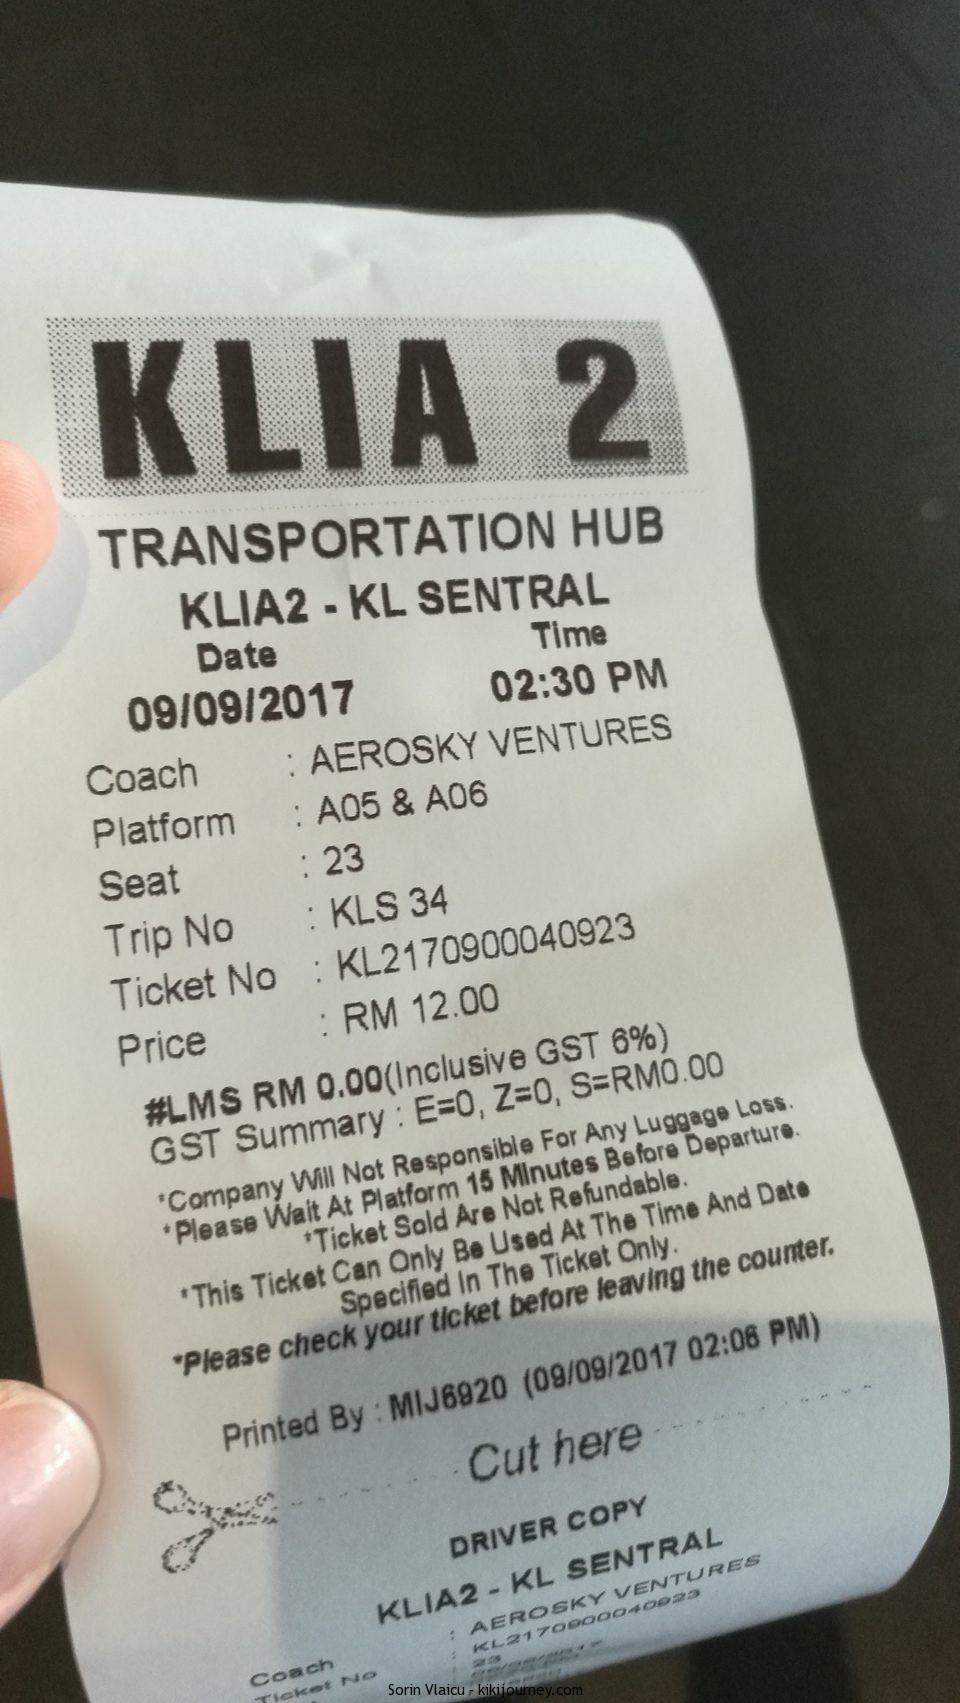 KLIA2 Airport to Kuala Lumpur